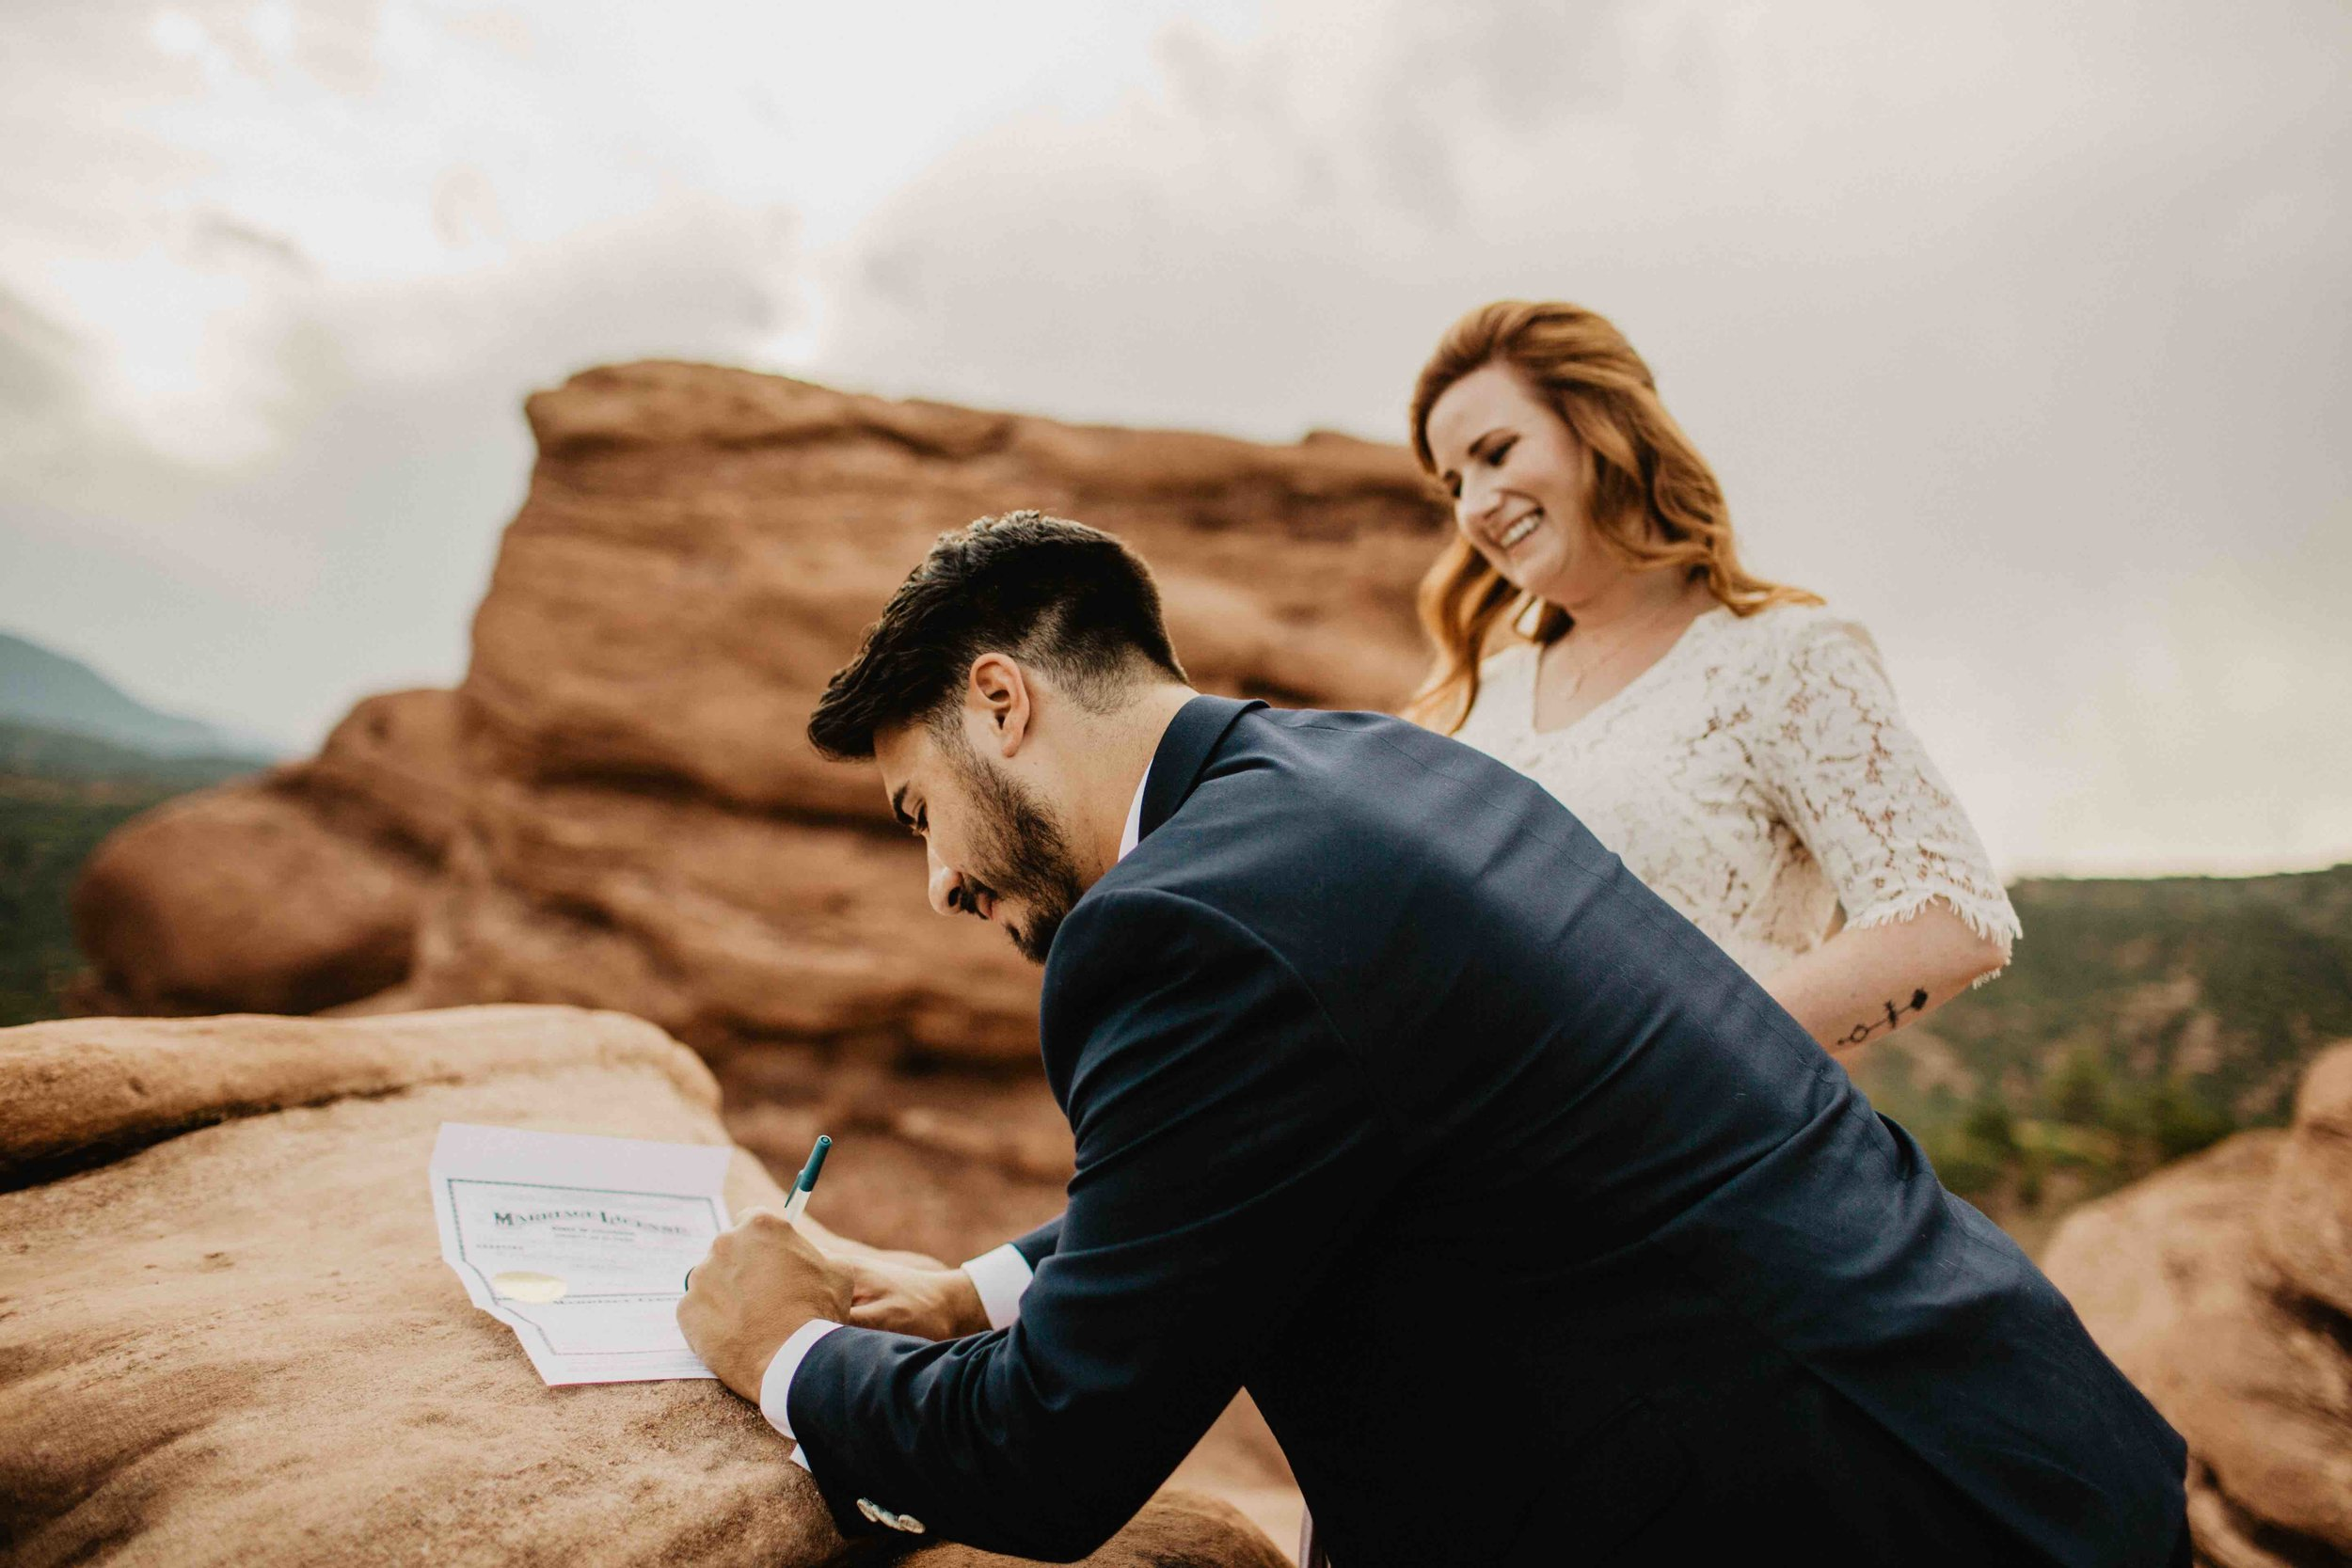 -colorado-wedding-photographer-denver-springs-vail-607A3920.jpeg